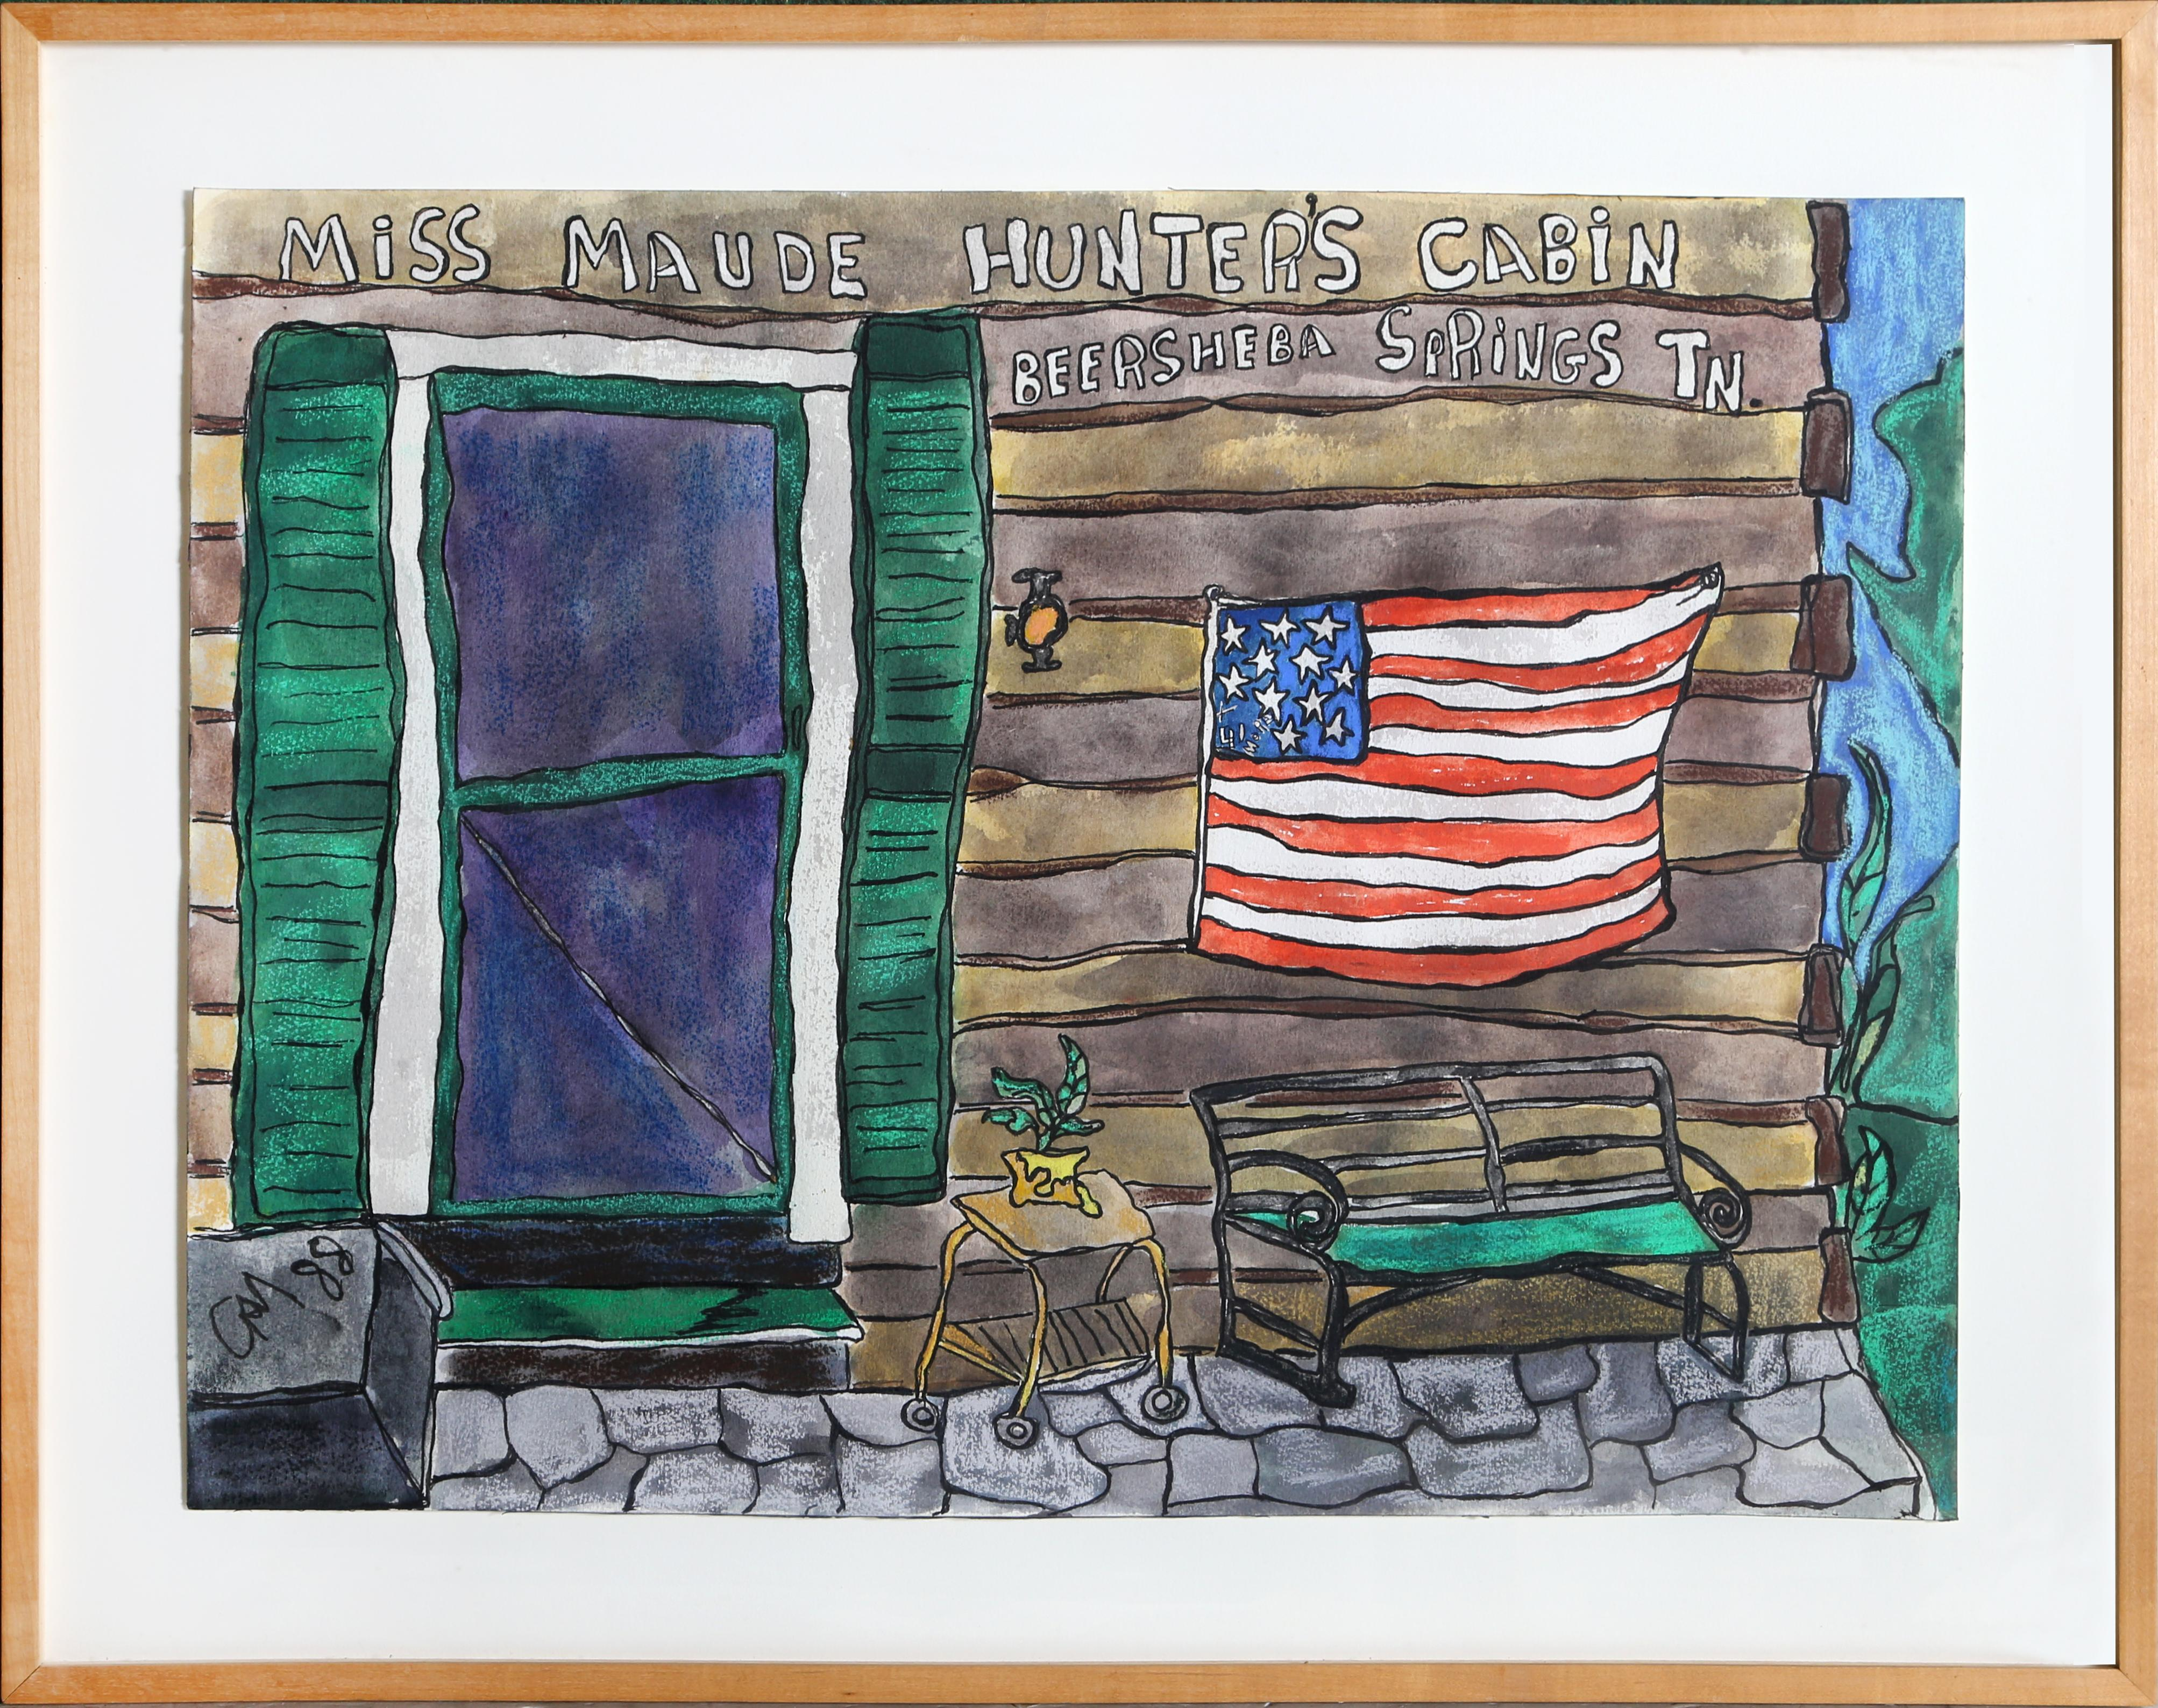 """Miss Maude Hunters Cabin, Beersheen Springs, TN"", 1988, Gay Kabbash"